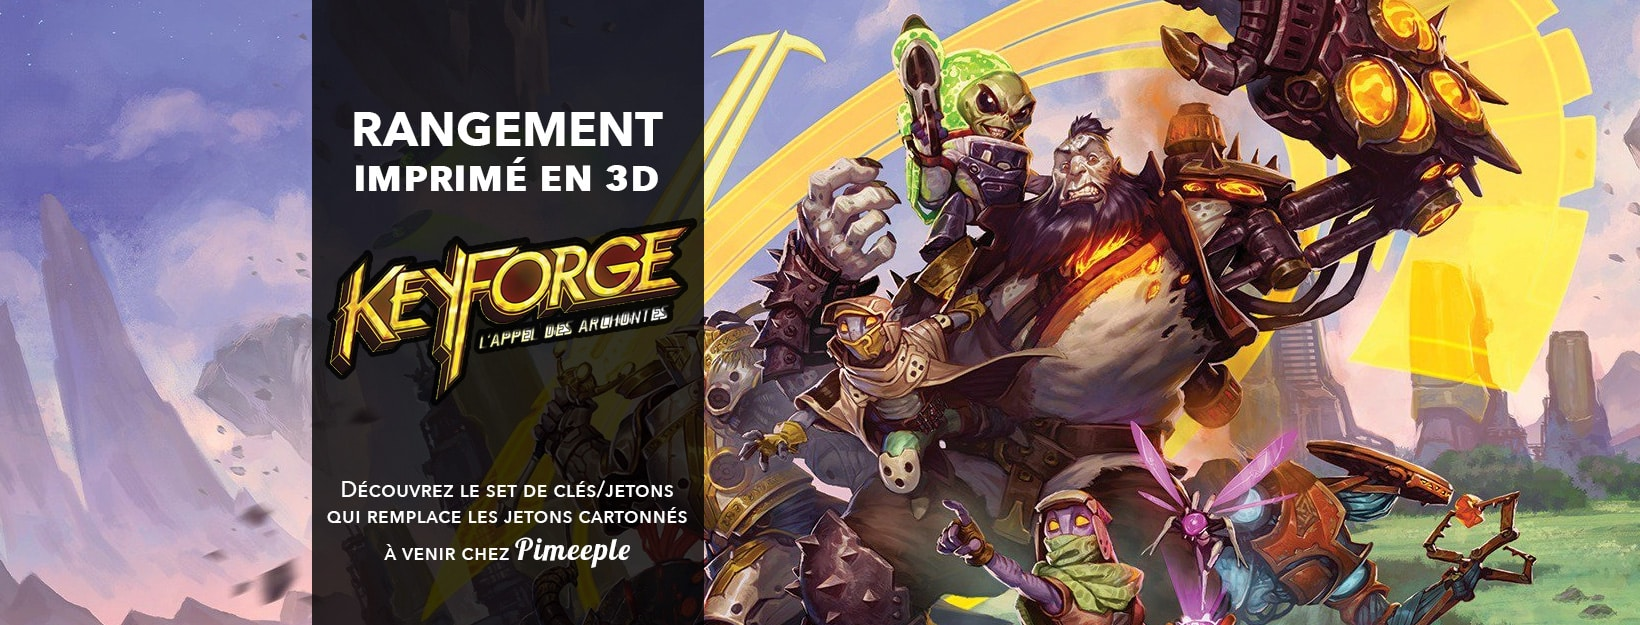 Rangement_3D_insert_keyforge